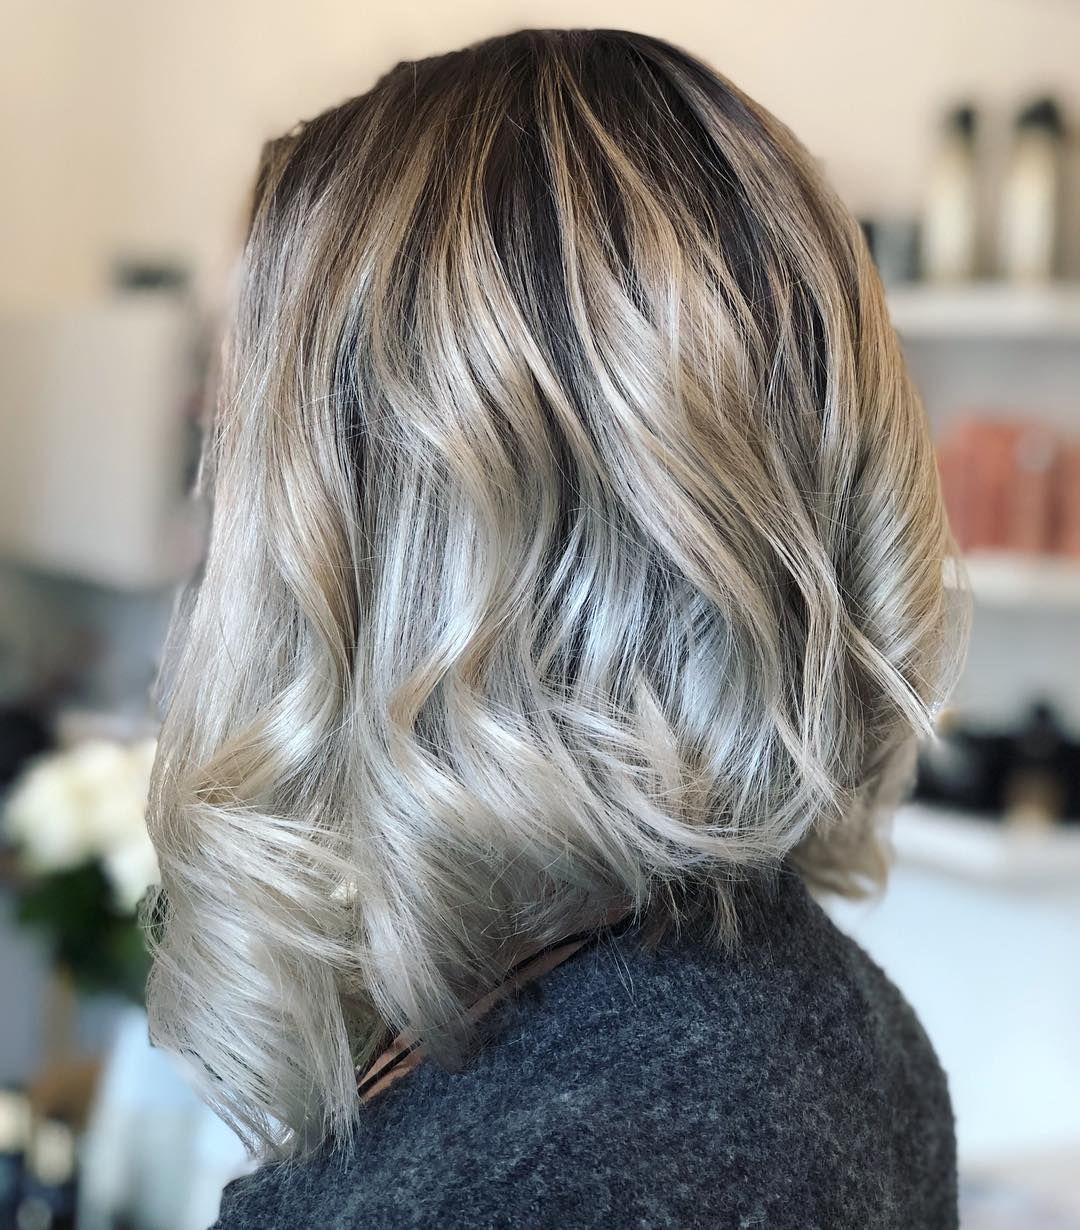 Toasted Coconut Is The Seasons Most Fall Friendly Hair Color Trend Hair Color Shades Kokosnuss Haar Trend Haarfarben Haar Styling